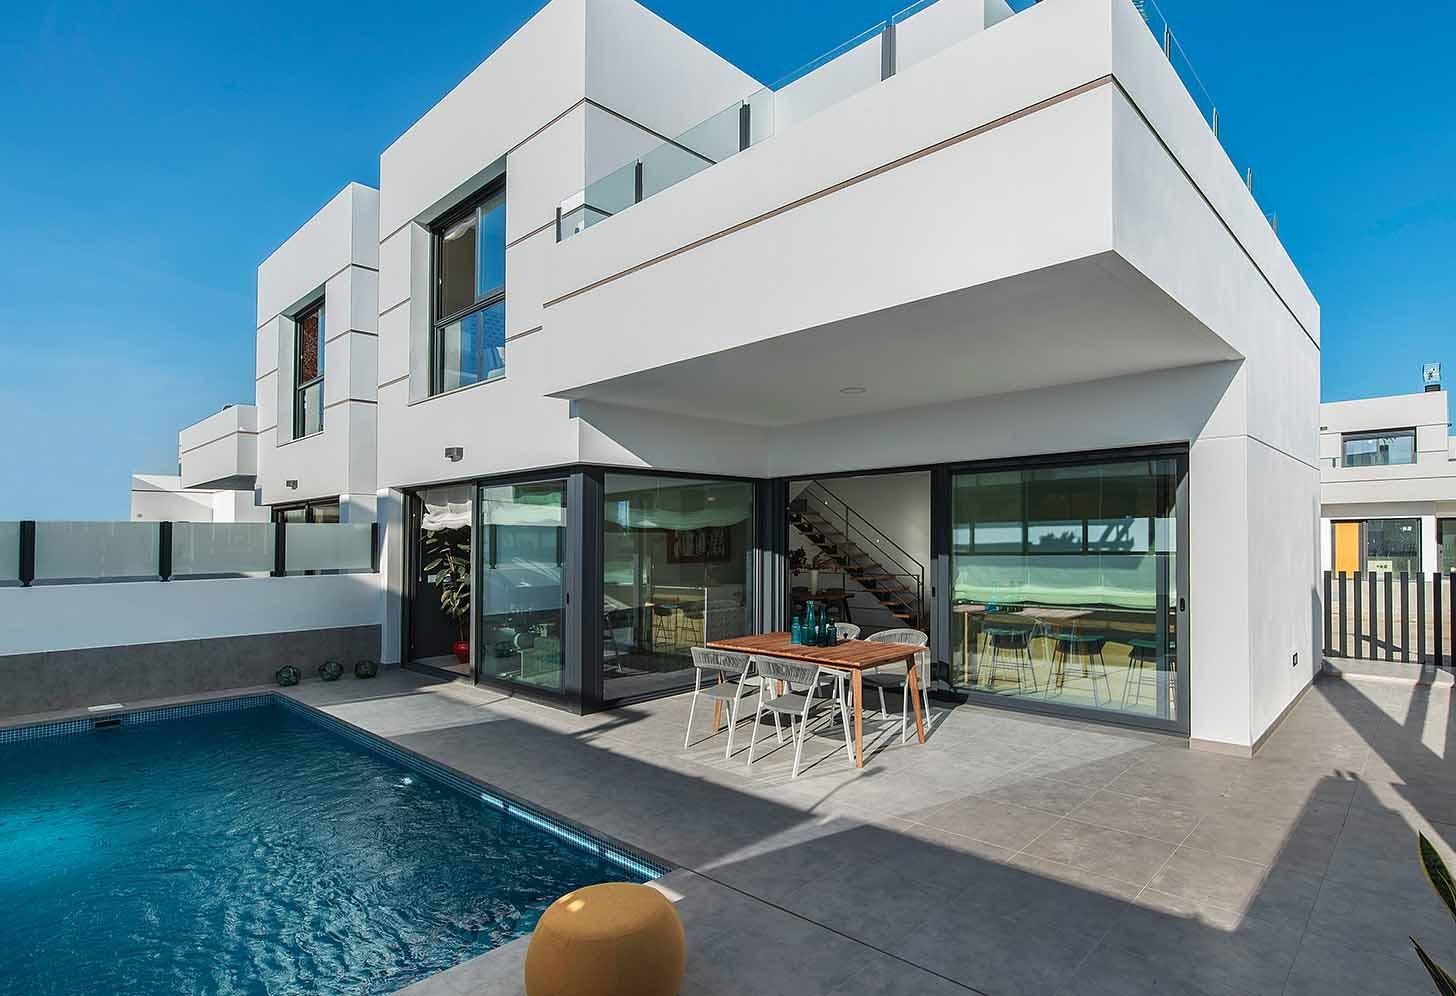 immobilier neuf espagne costa blanca sur alicante dolores piscine